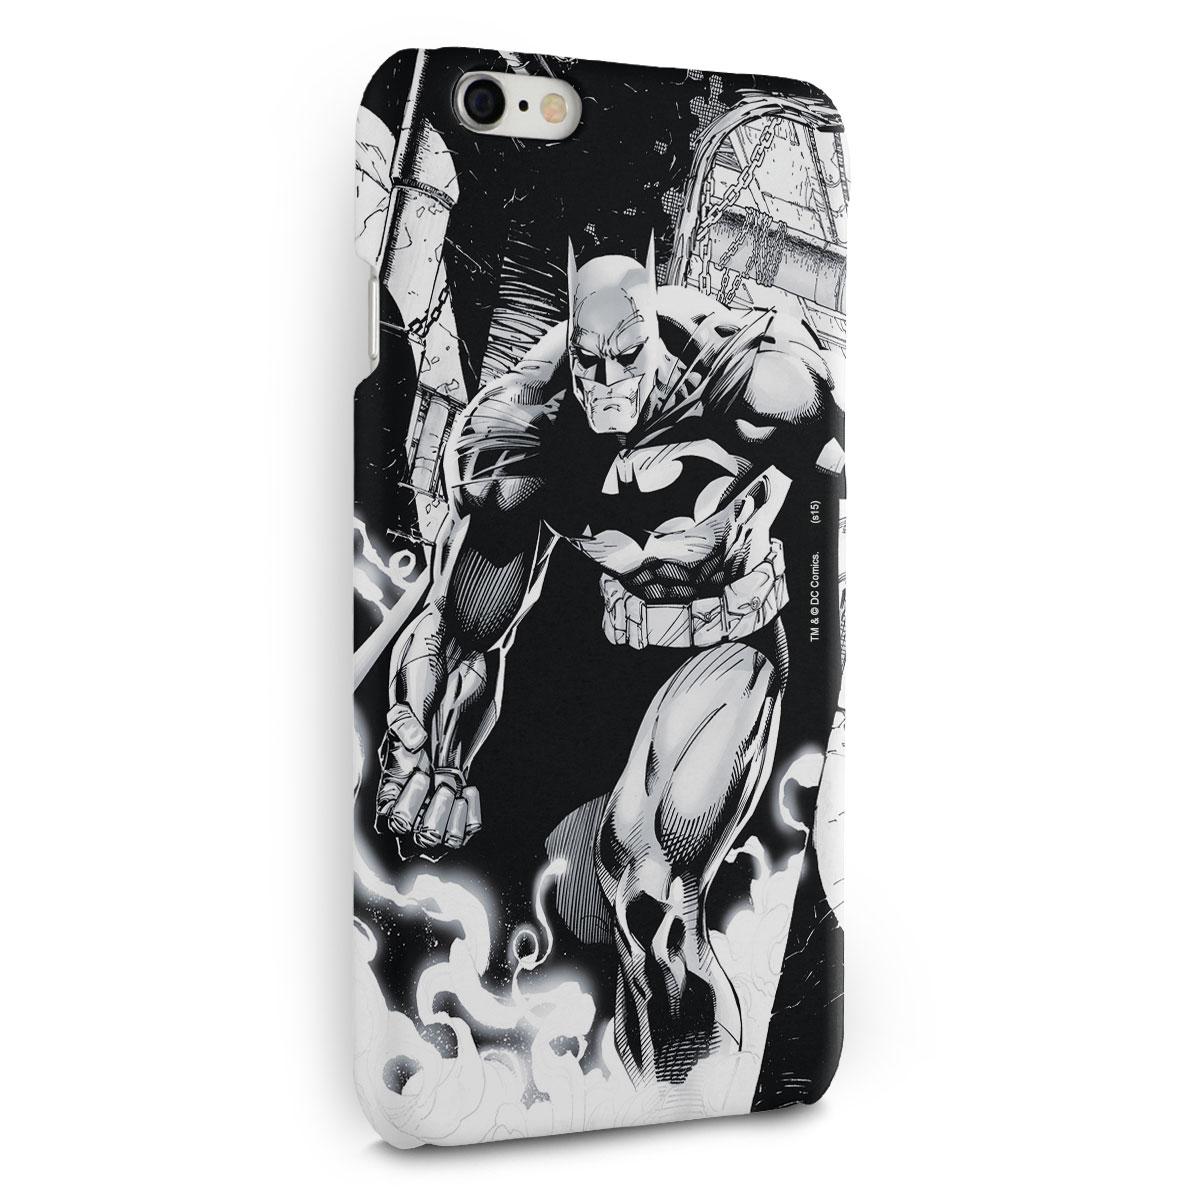 Capa para iPhone 6/6S Plus Tracing Batman